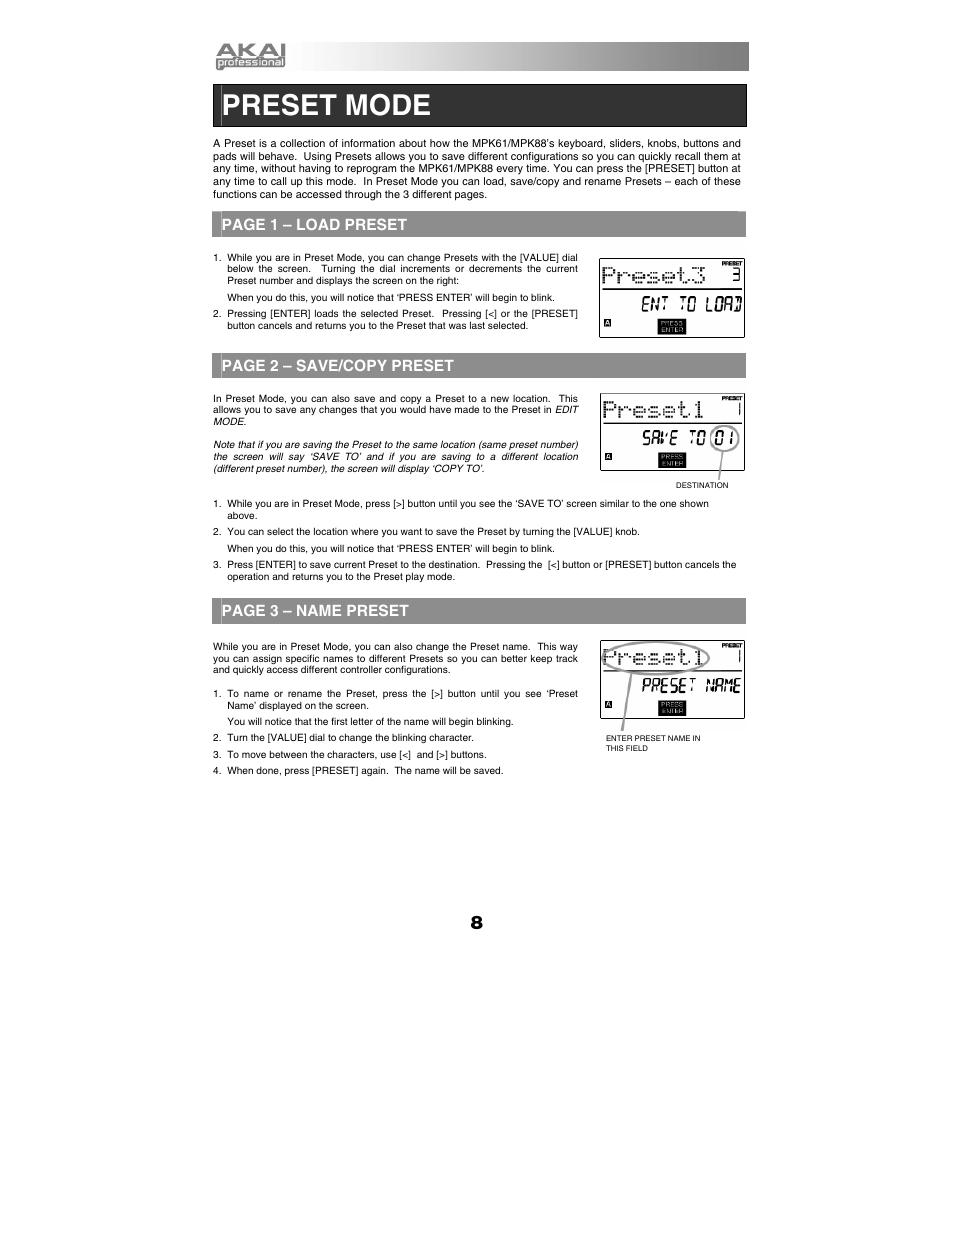 Preset mode, Page 1 – load preset, Page 2 – save/copy preset